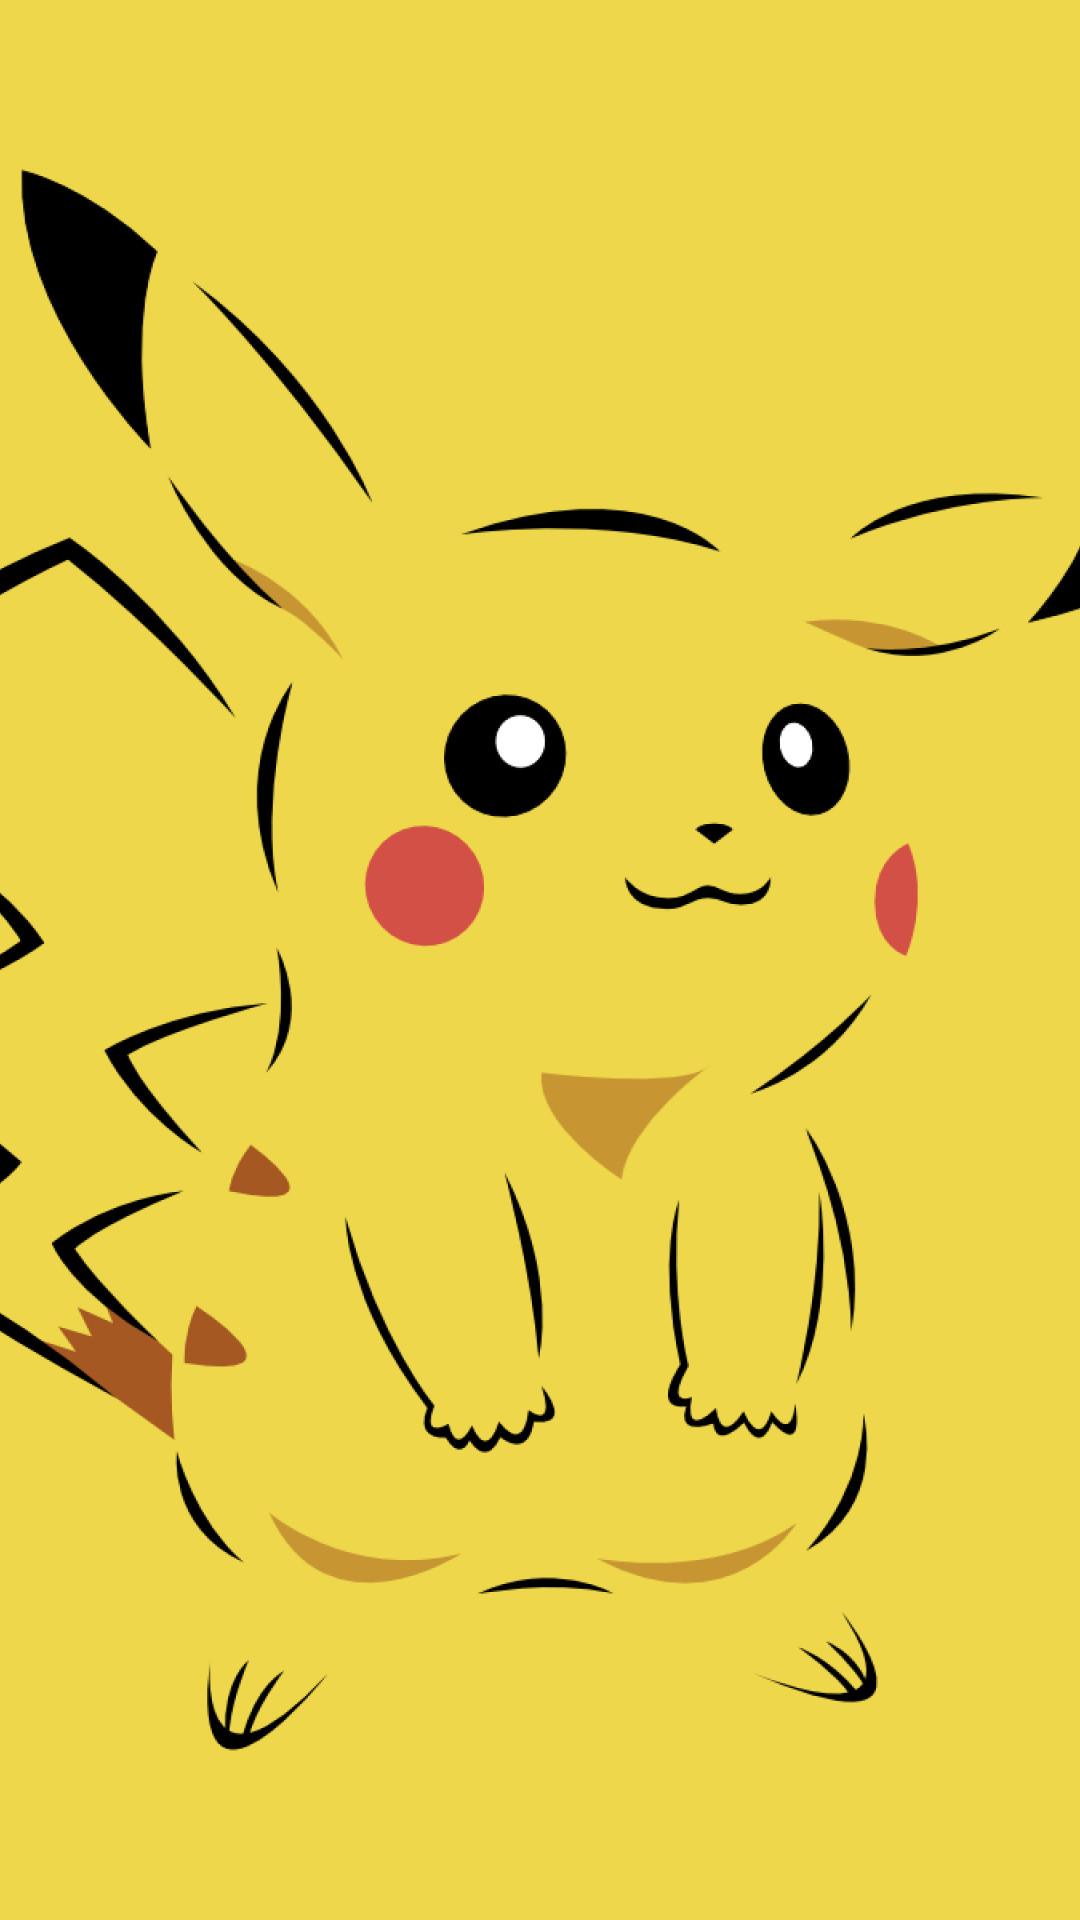 Best Free Pokemon iPhone Wallpapers.